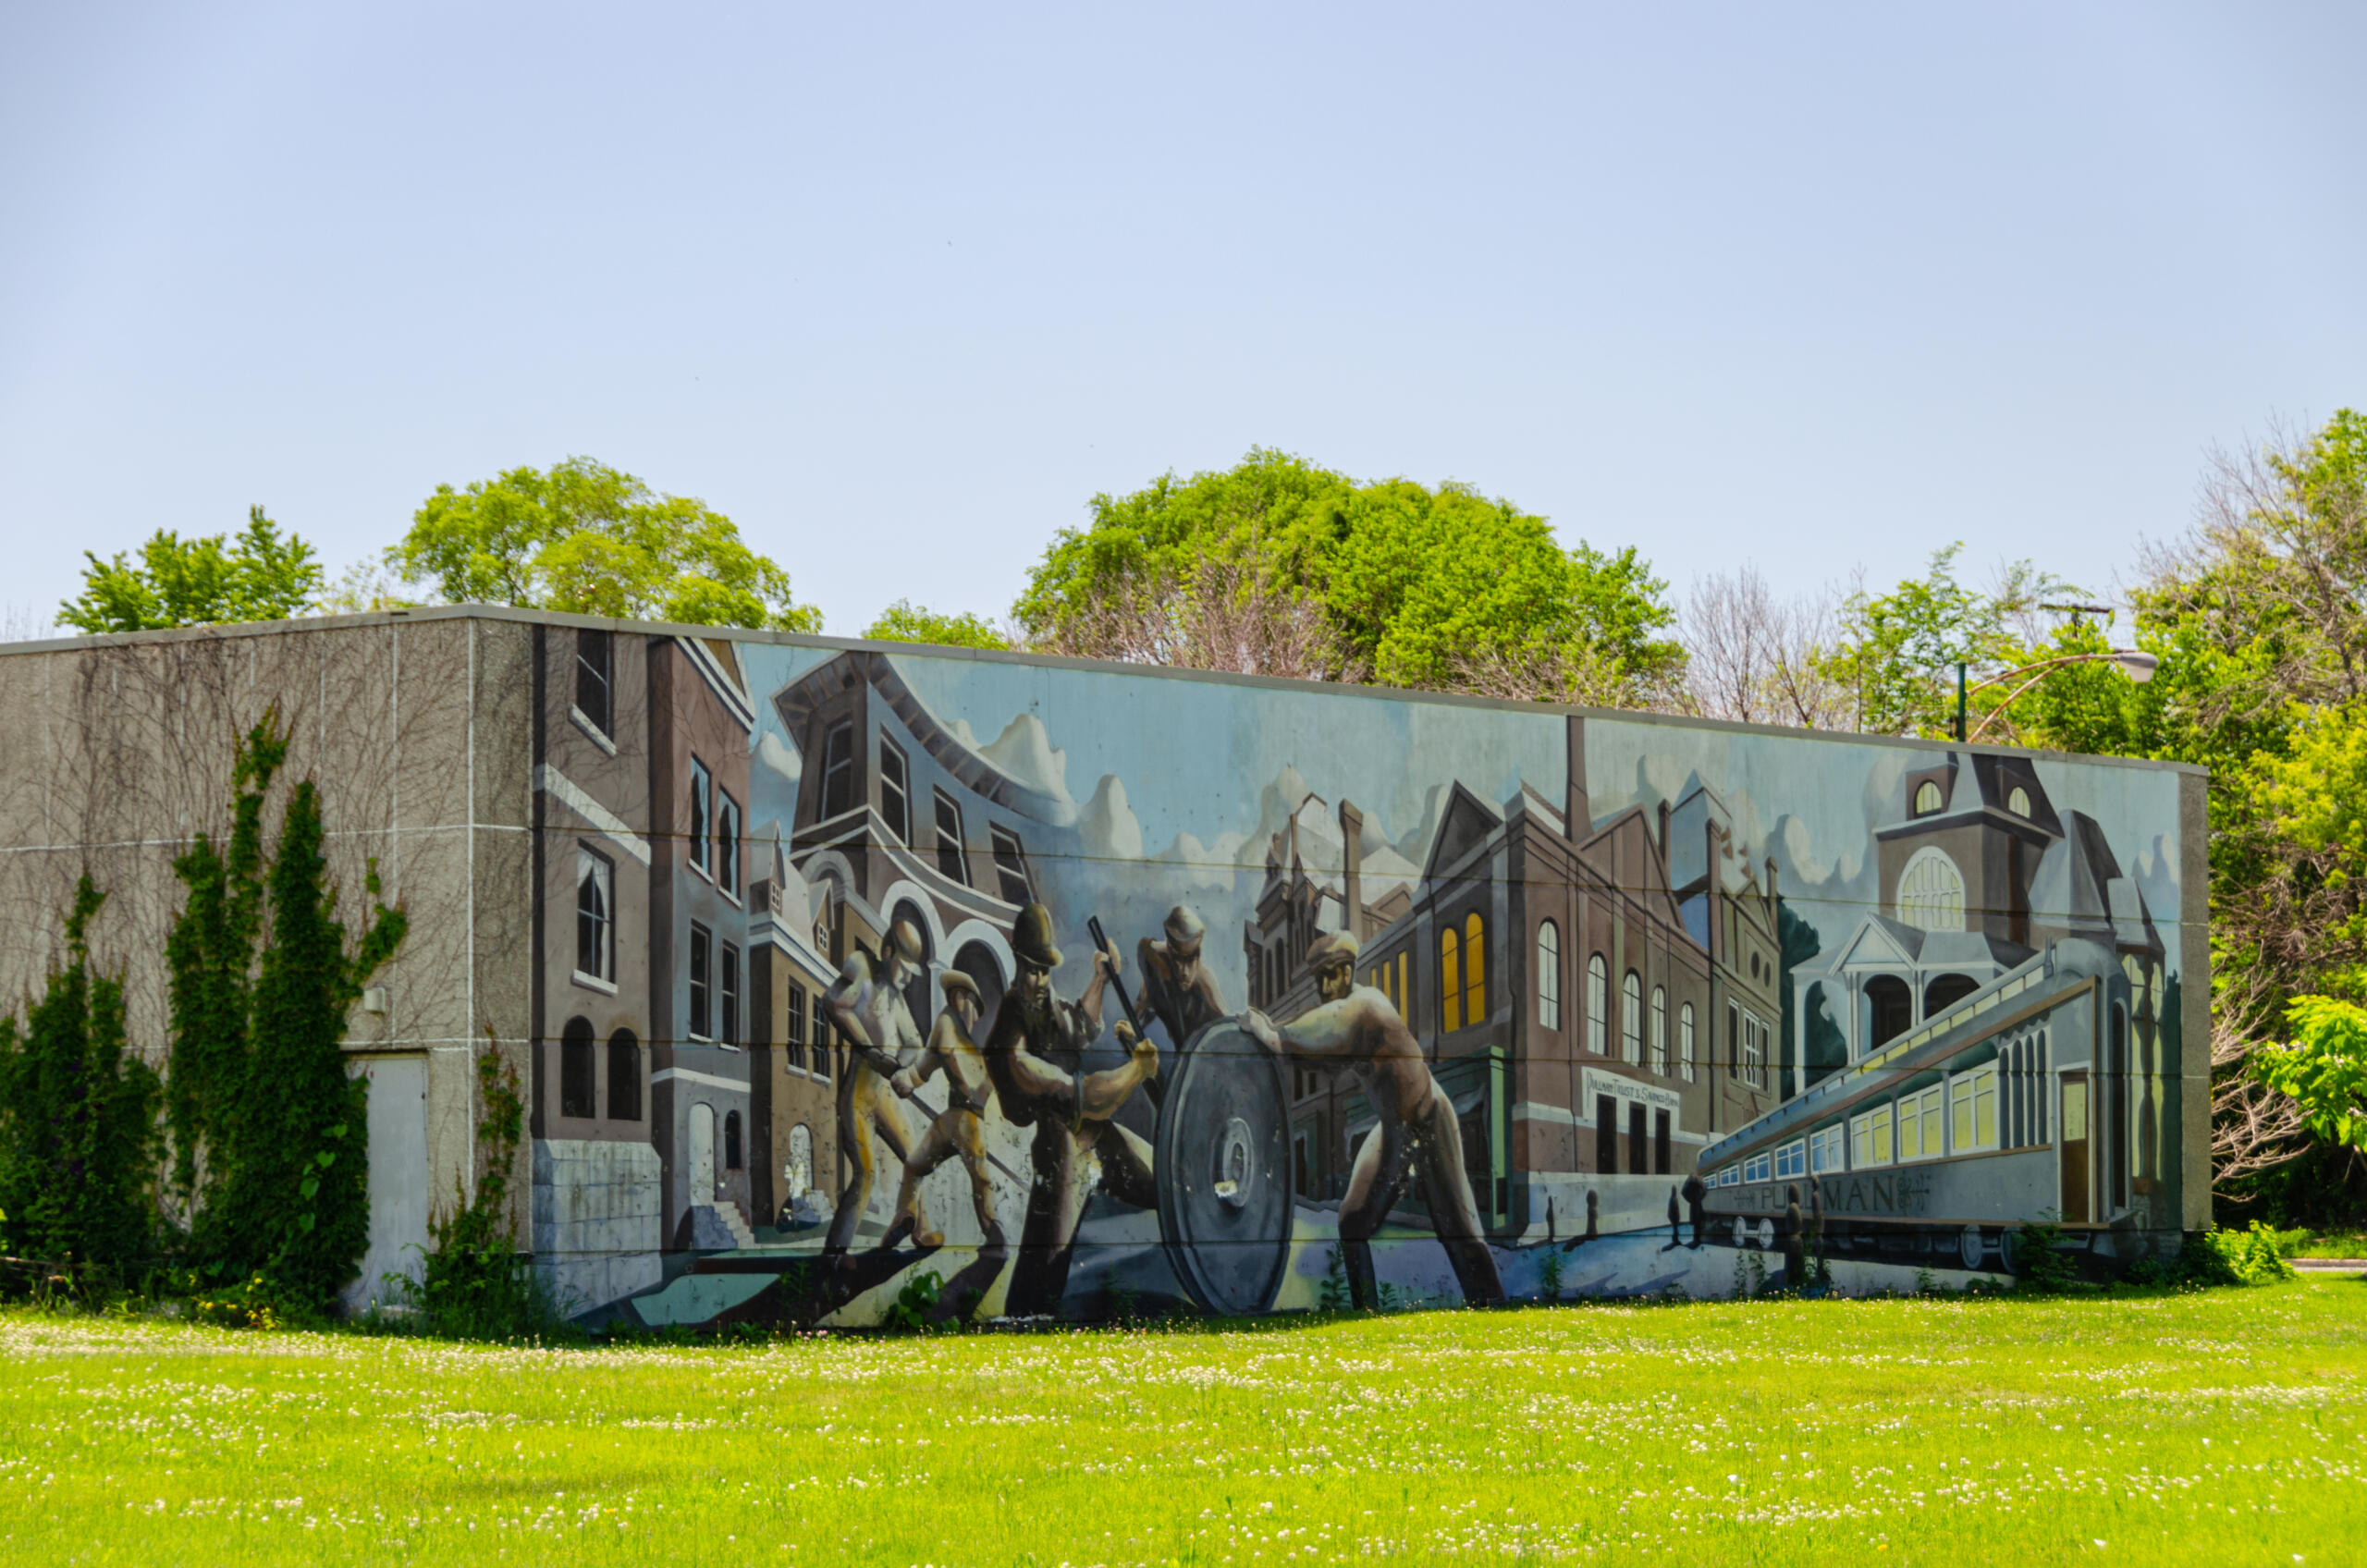 Pullman mural on Historic Pullman Foundation Pullman Exhibit Hall (Credit Historic Pullman Foundation_ Eric Allix Rogers)